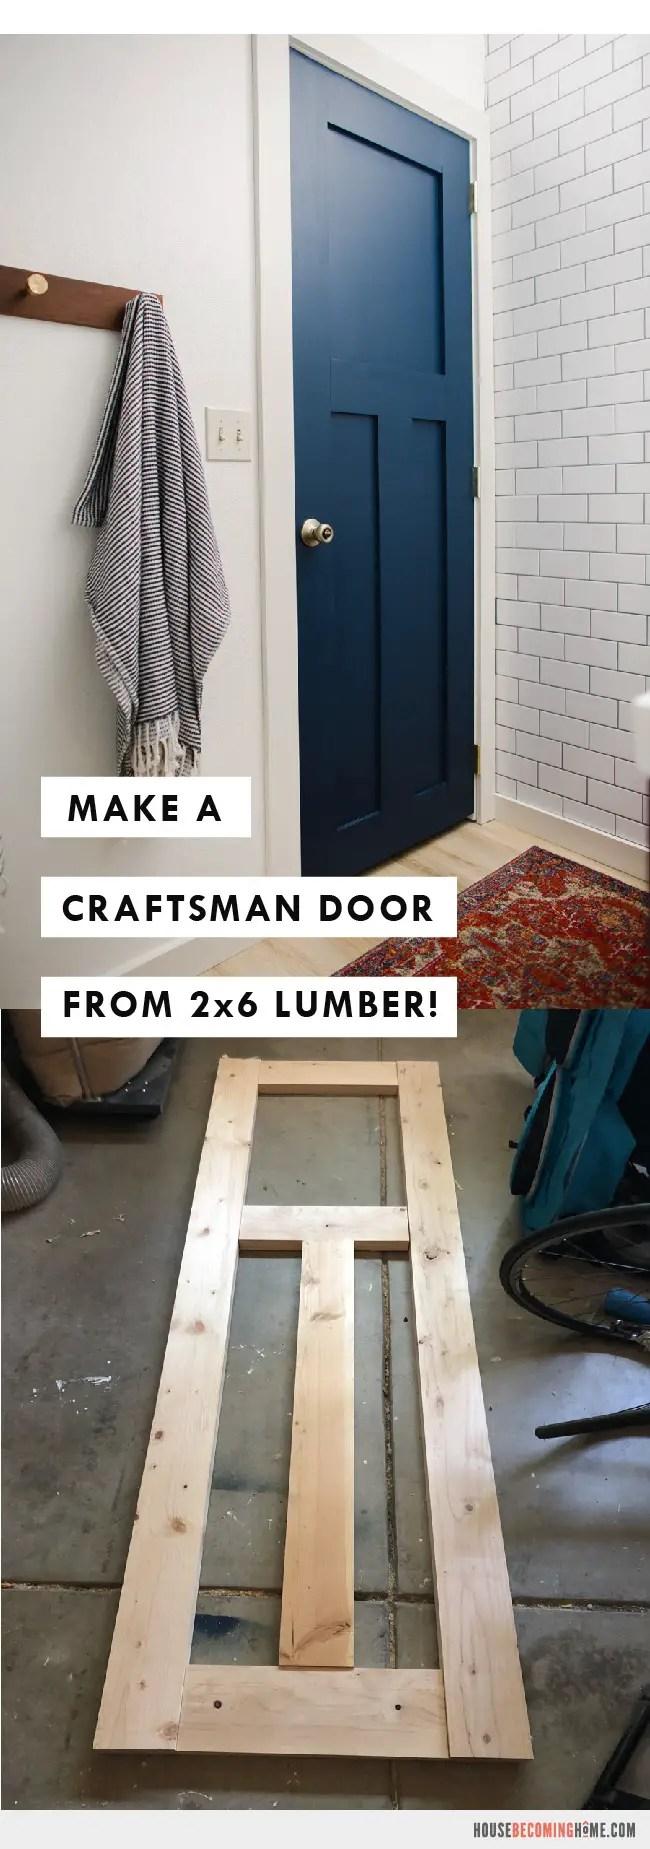 Make a Door from 2x6 Lumber Tutorial